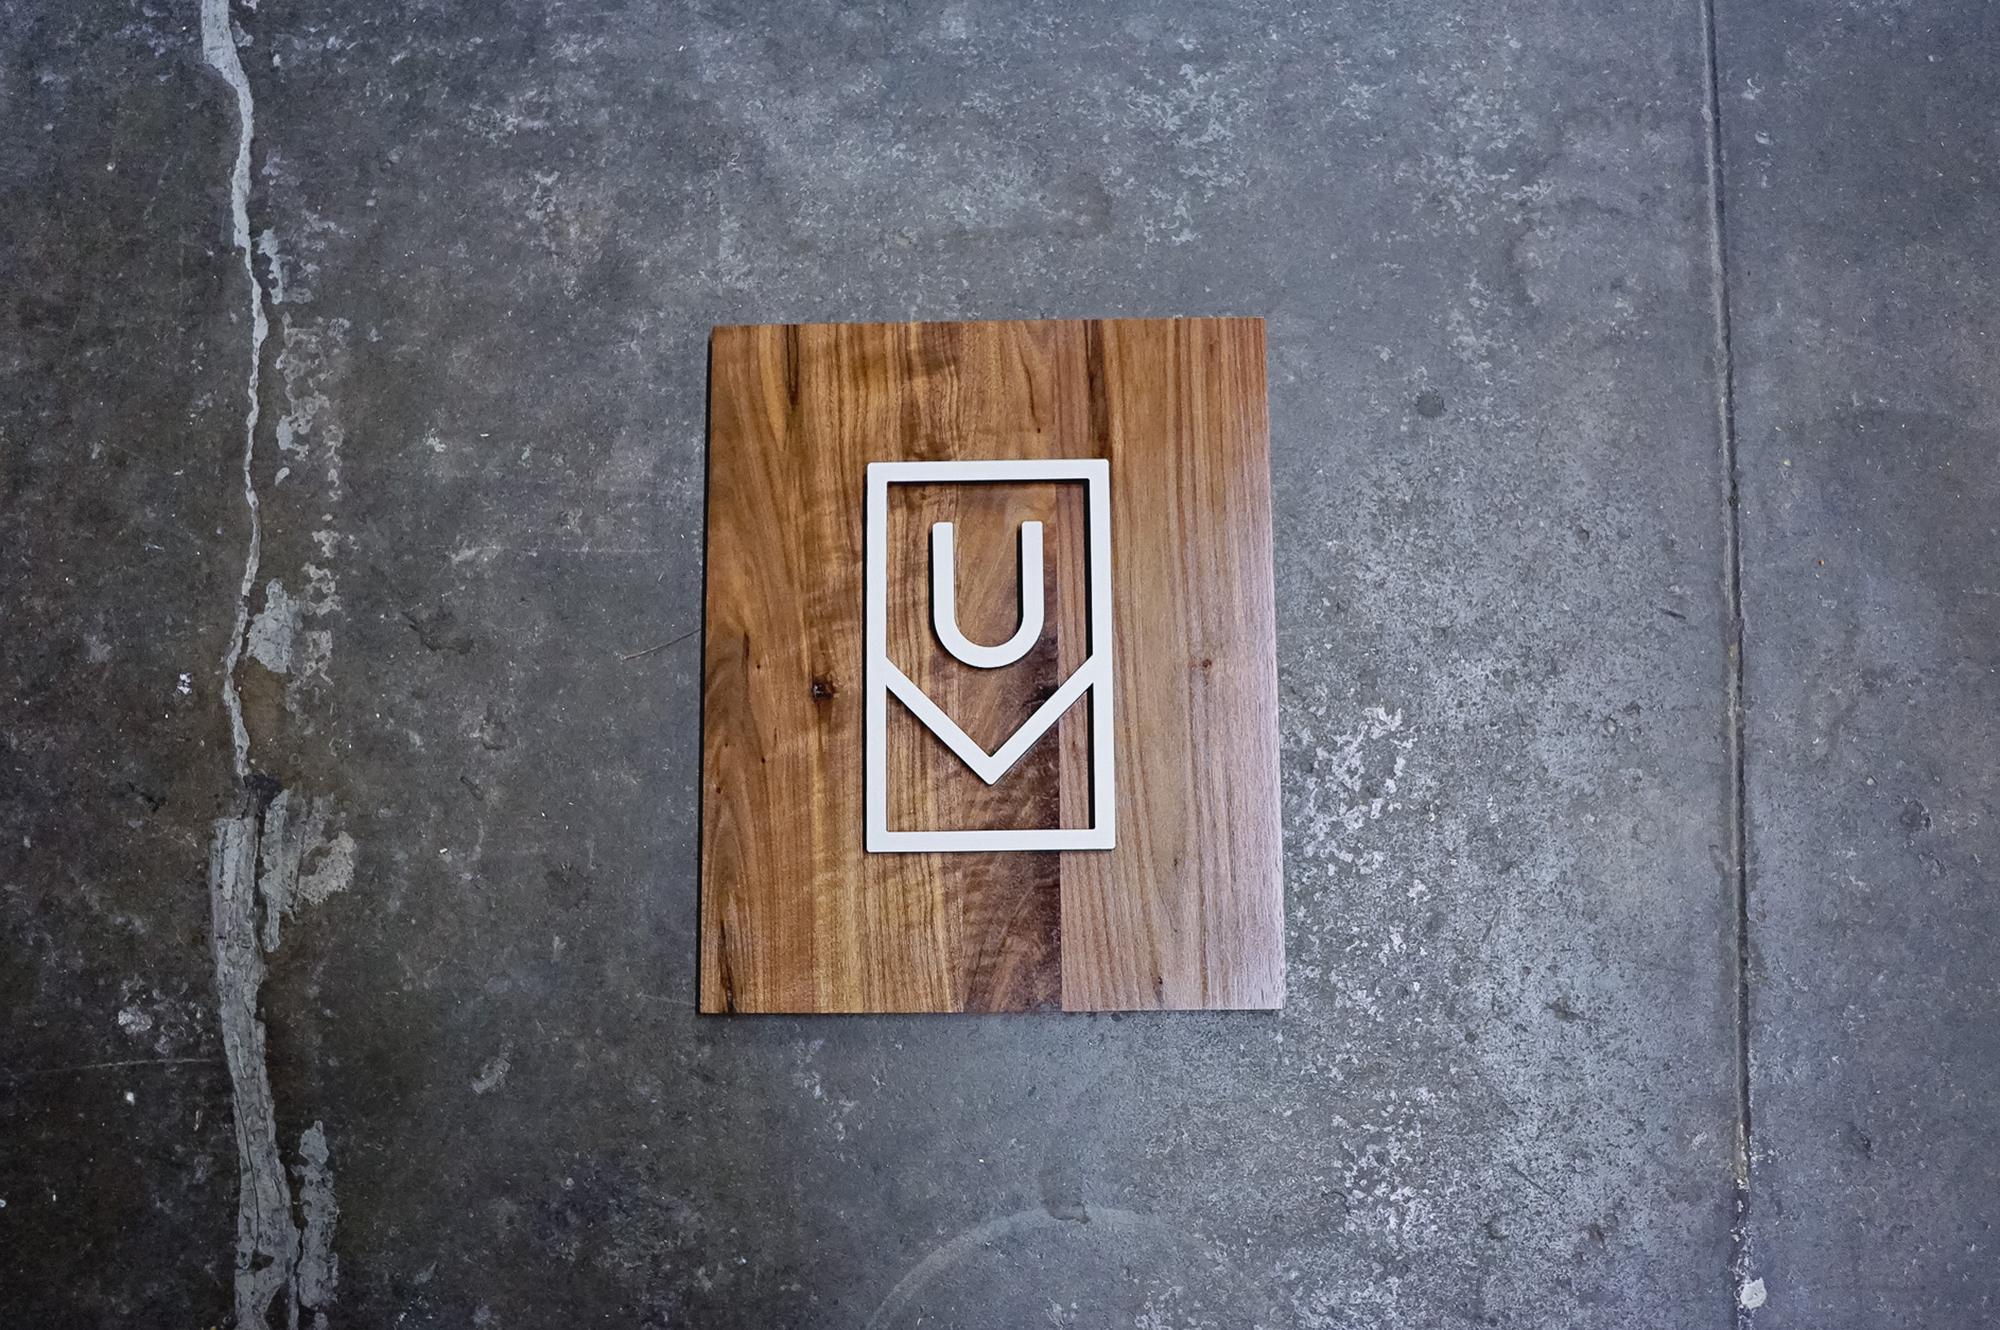 Ugmonk modern walnut and white logo / icon sign